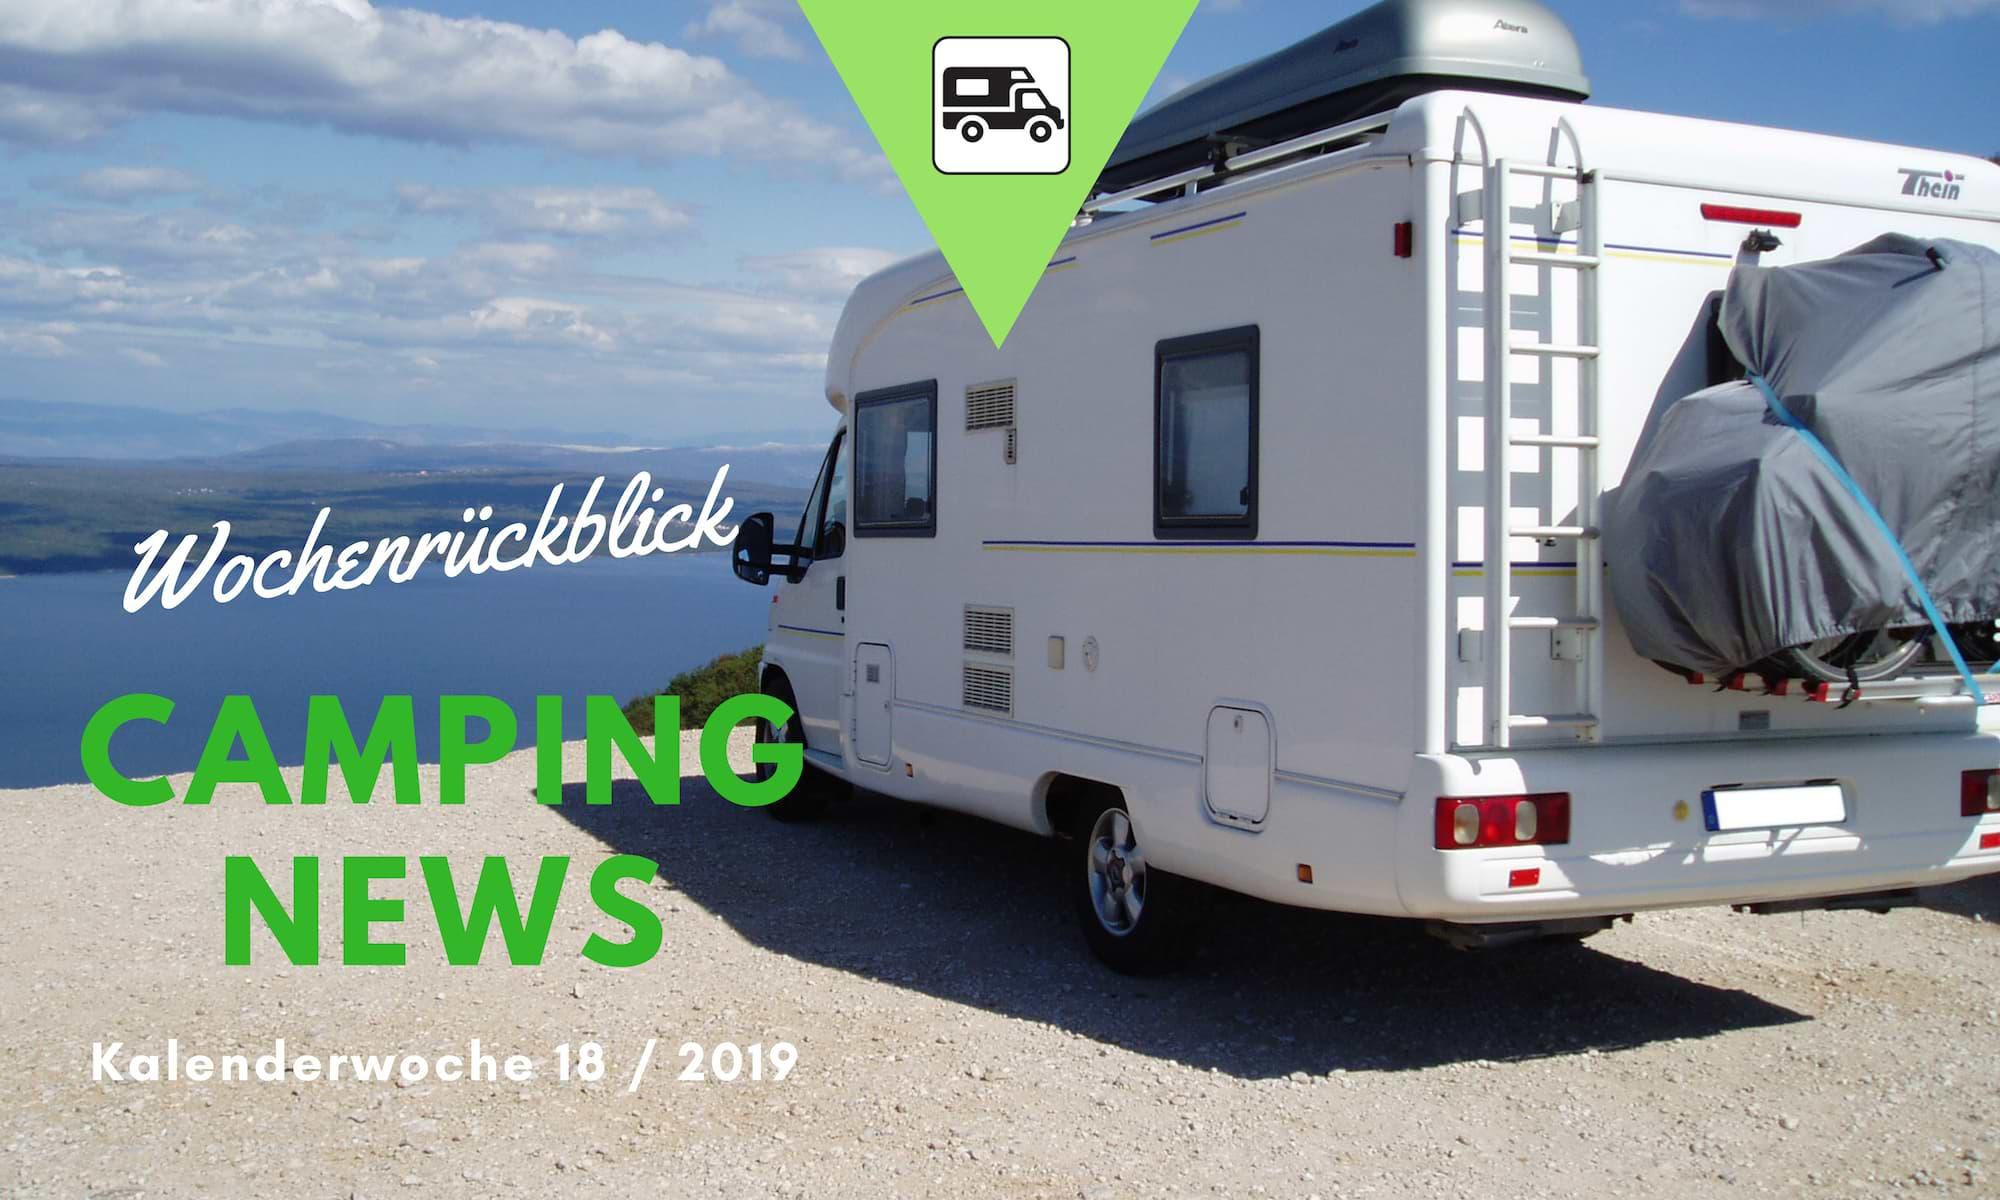 Wochenrückblick Camping News KW18-2019